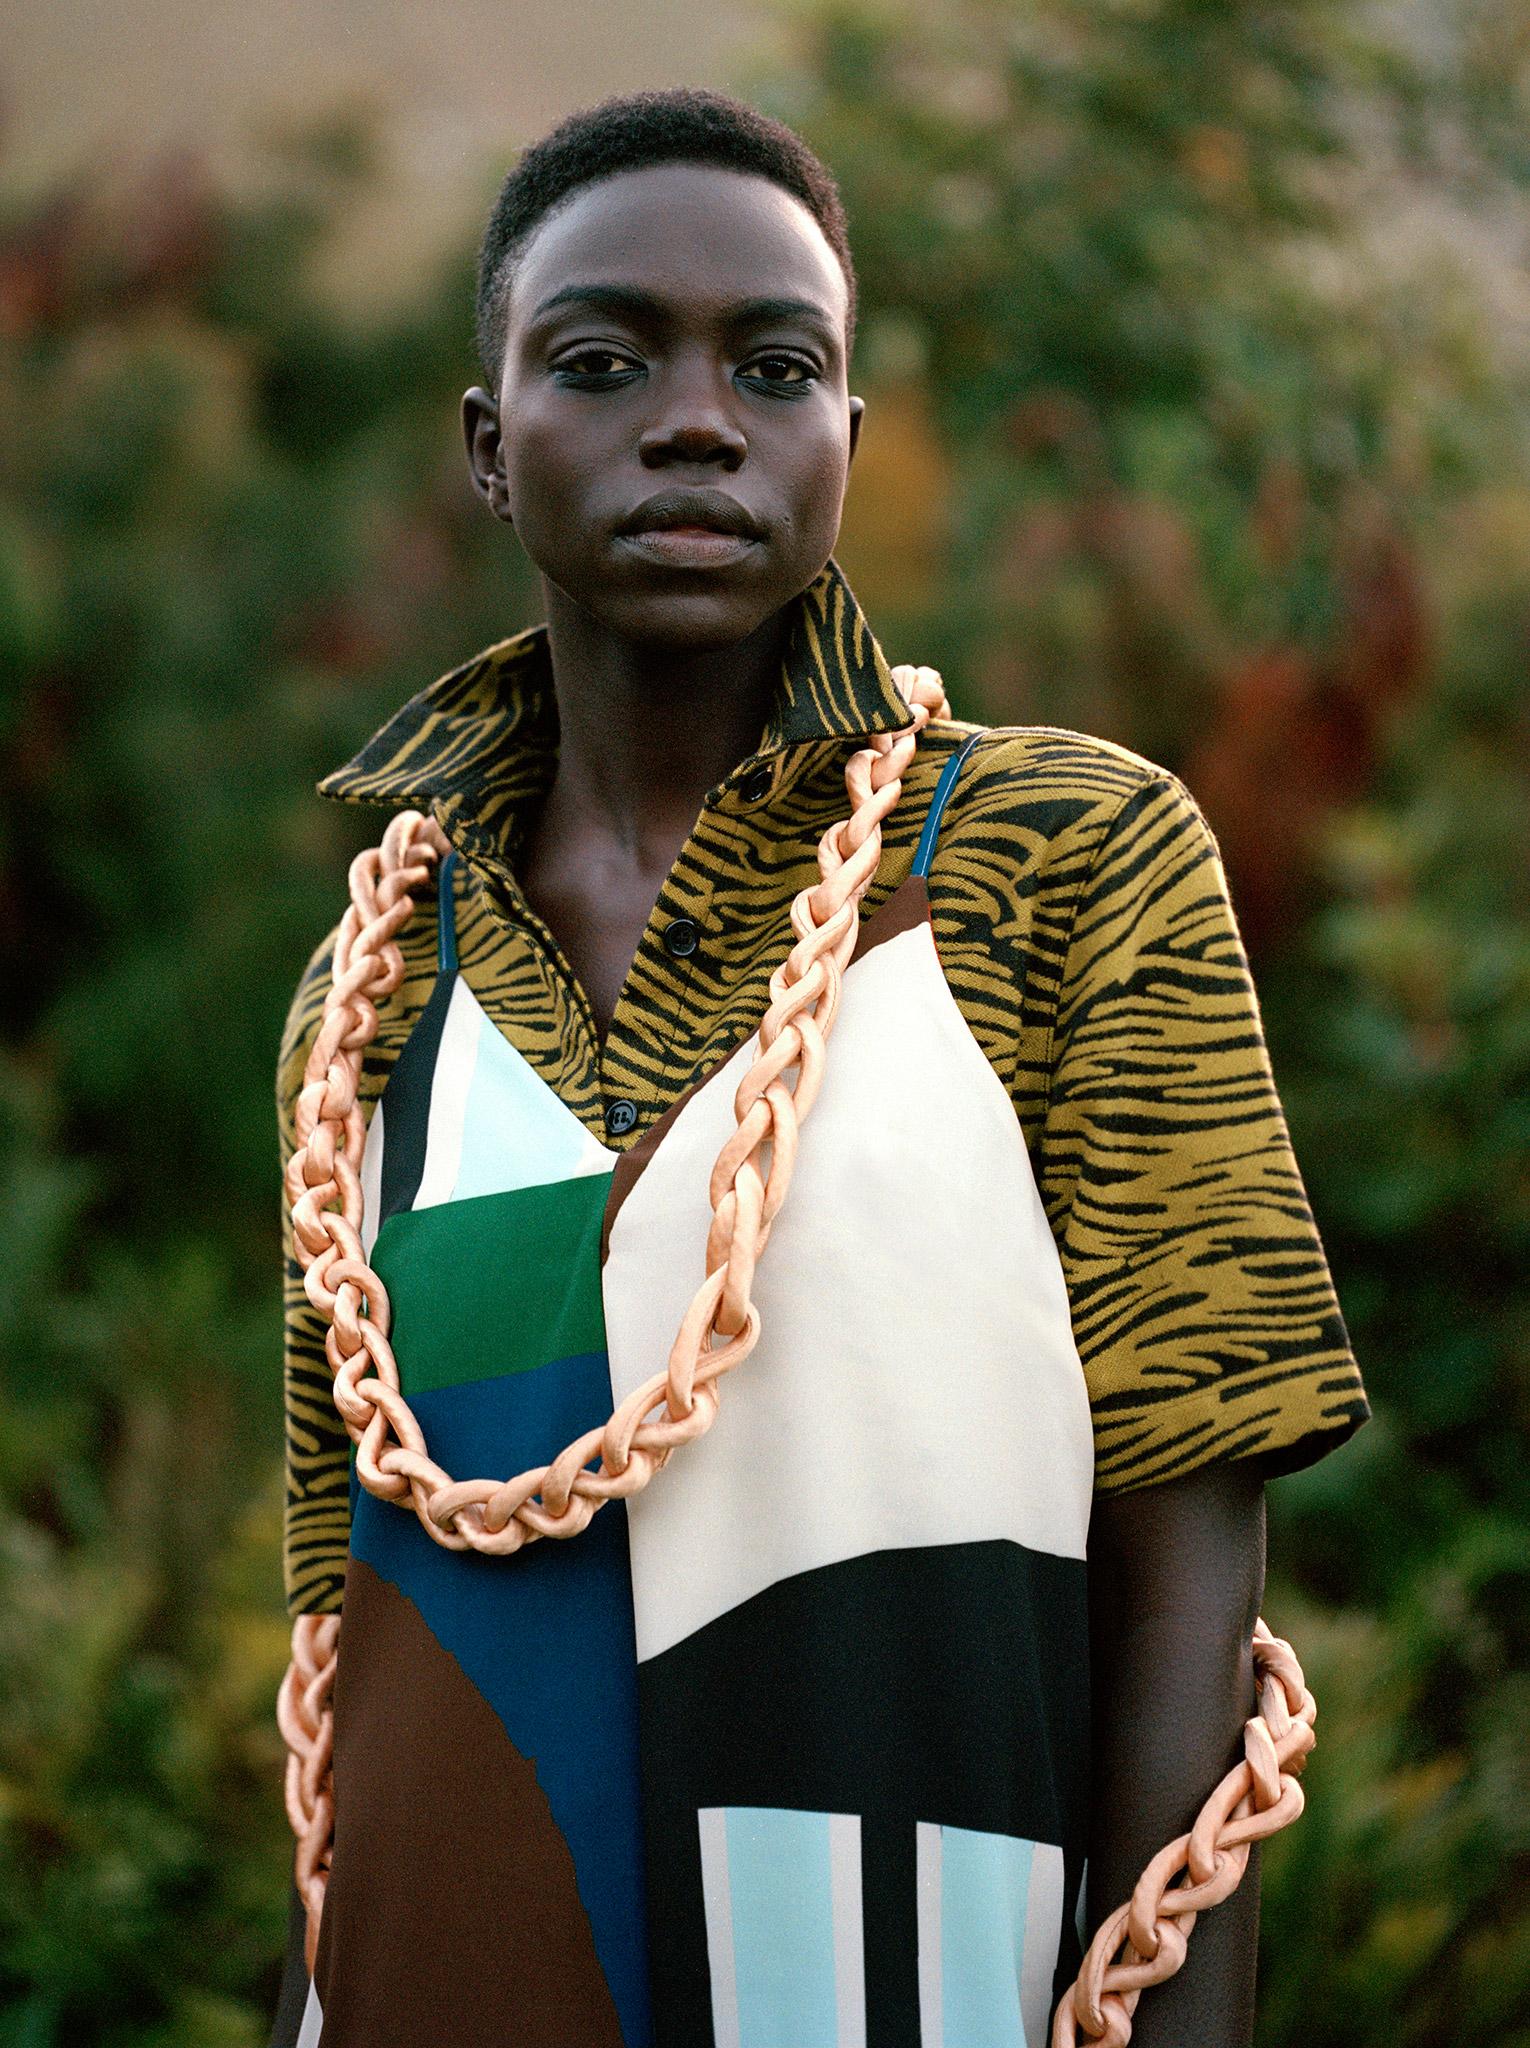 Jumpsuit by Selfi, shirt by AKJP, jewellery by W35T